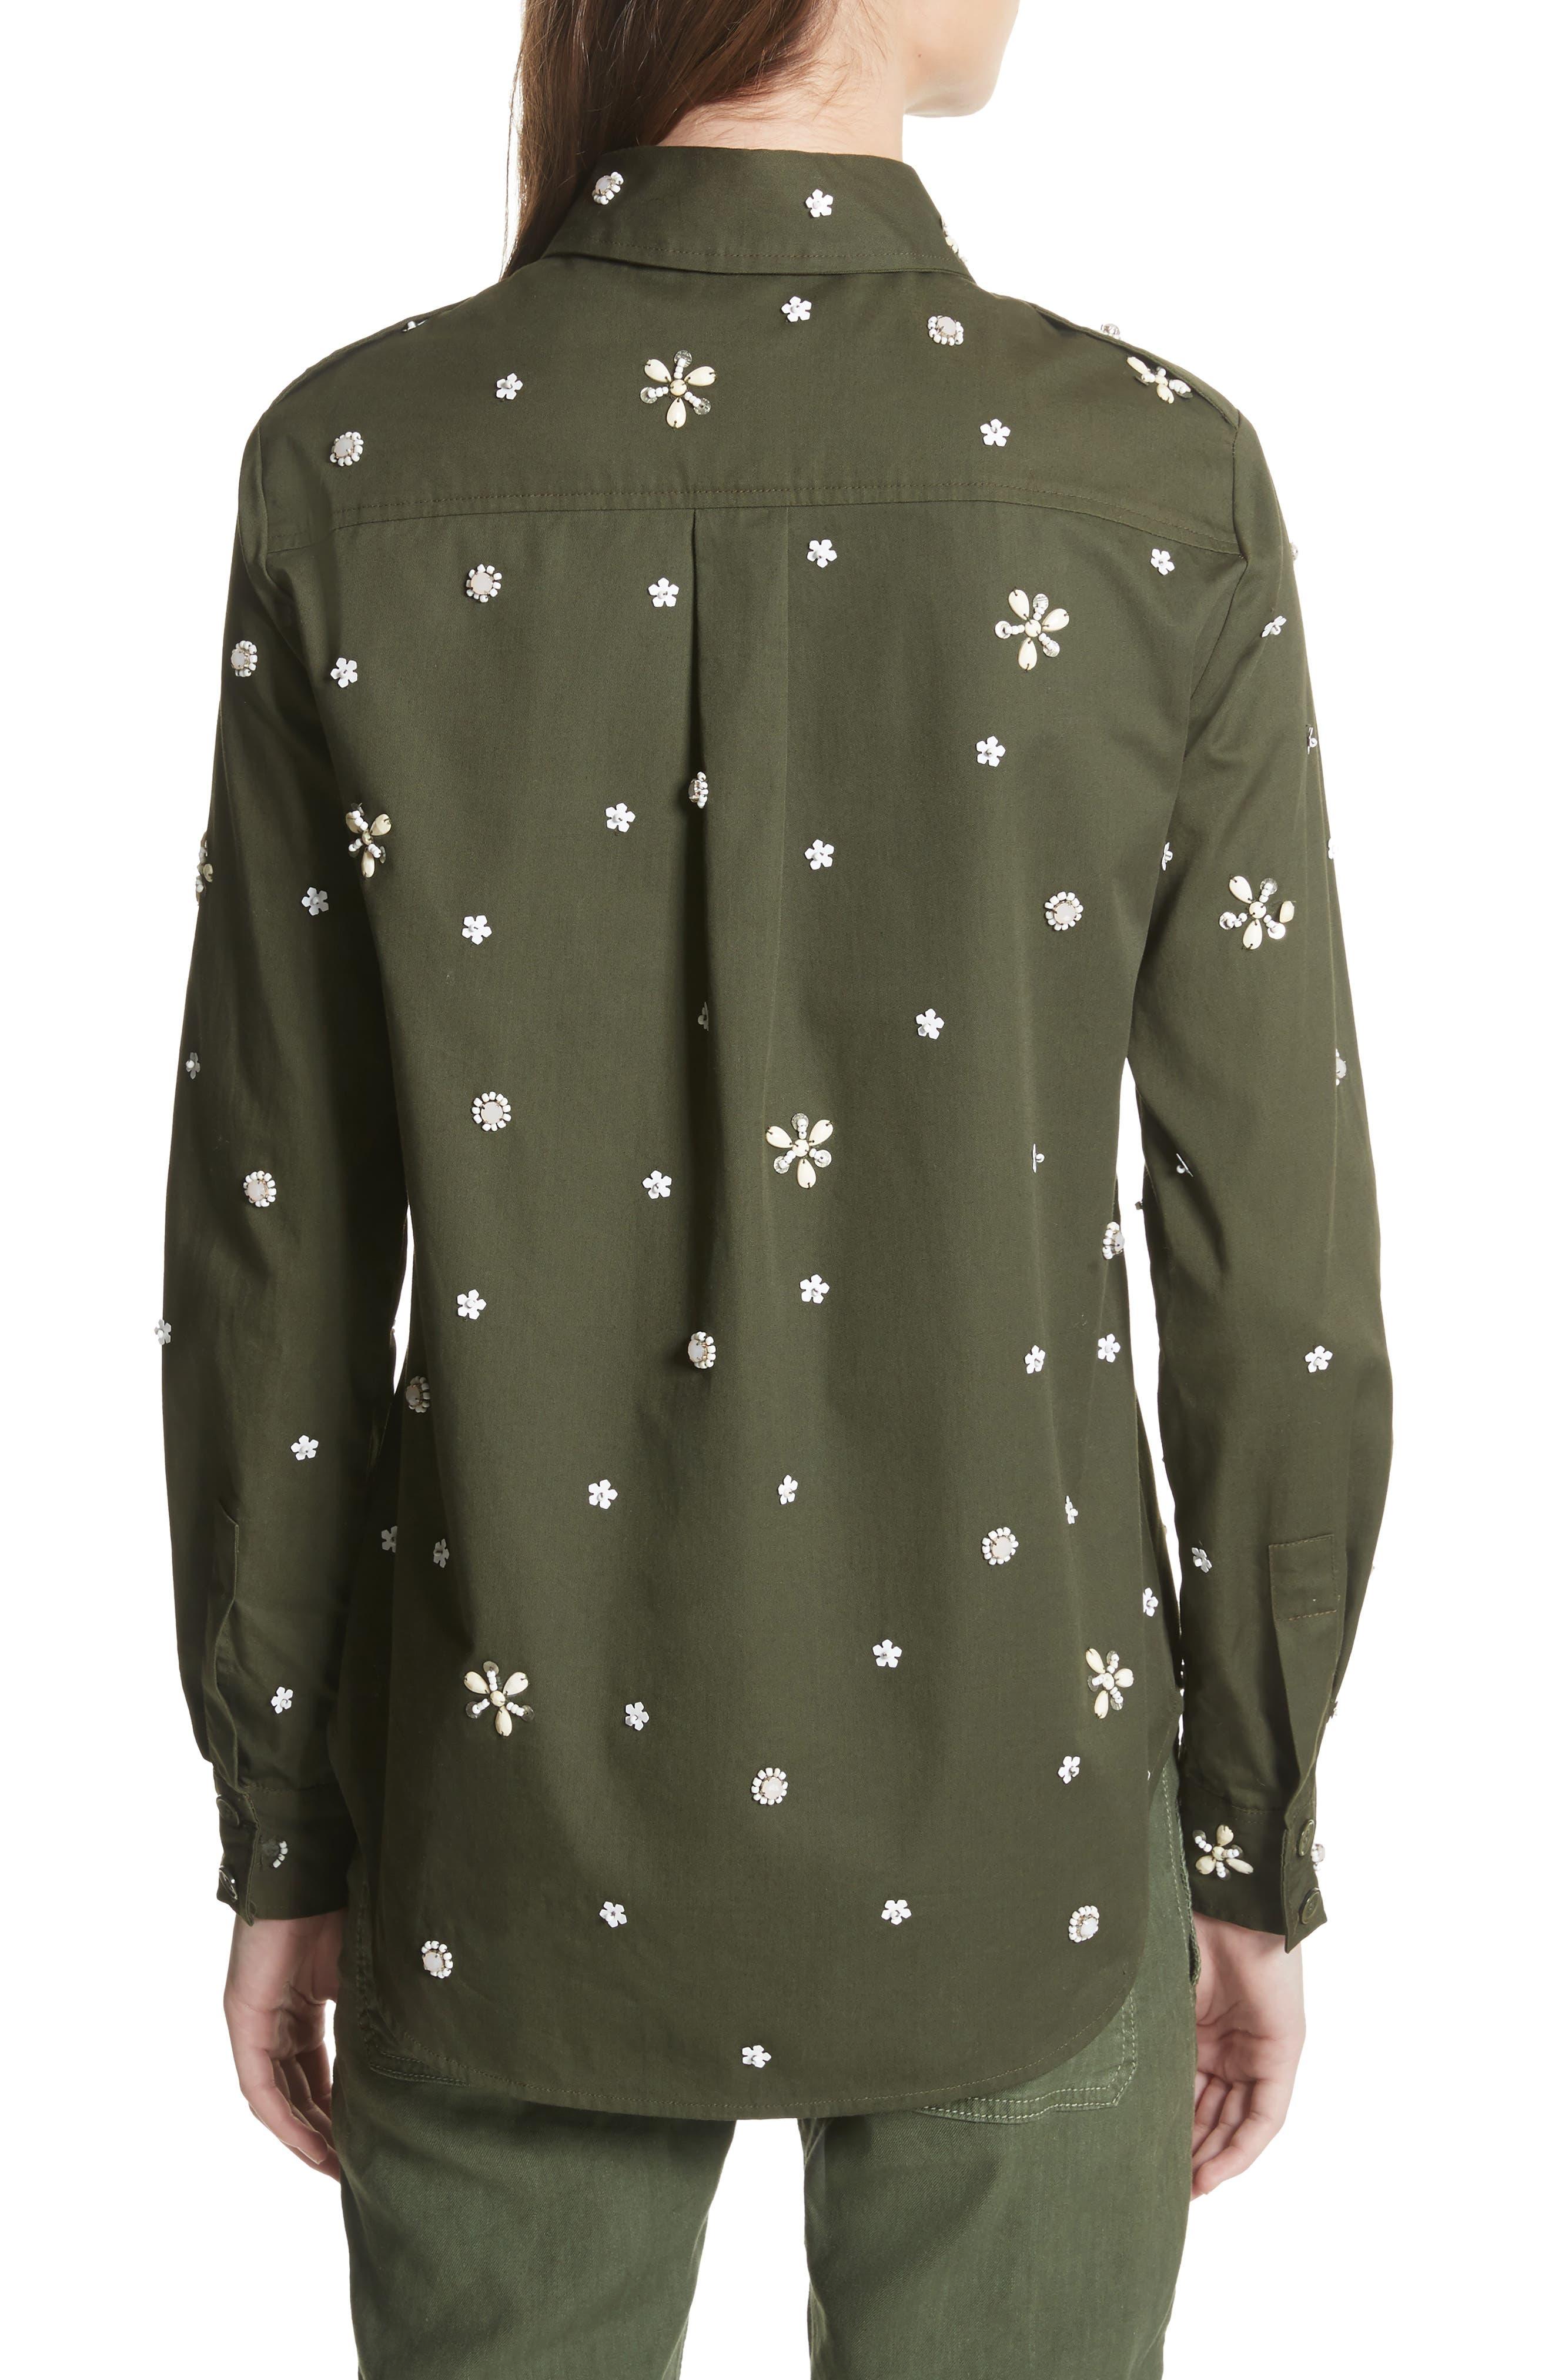 Hayfa Embellished Shirt,                             Alternate thumbnail 2, color,                             Deep Army